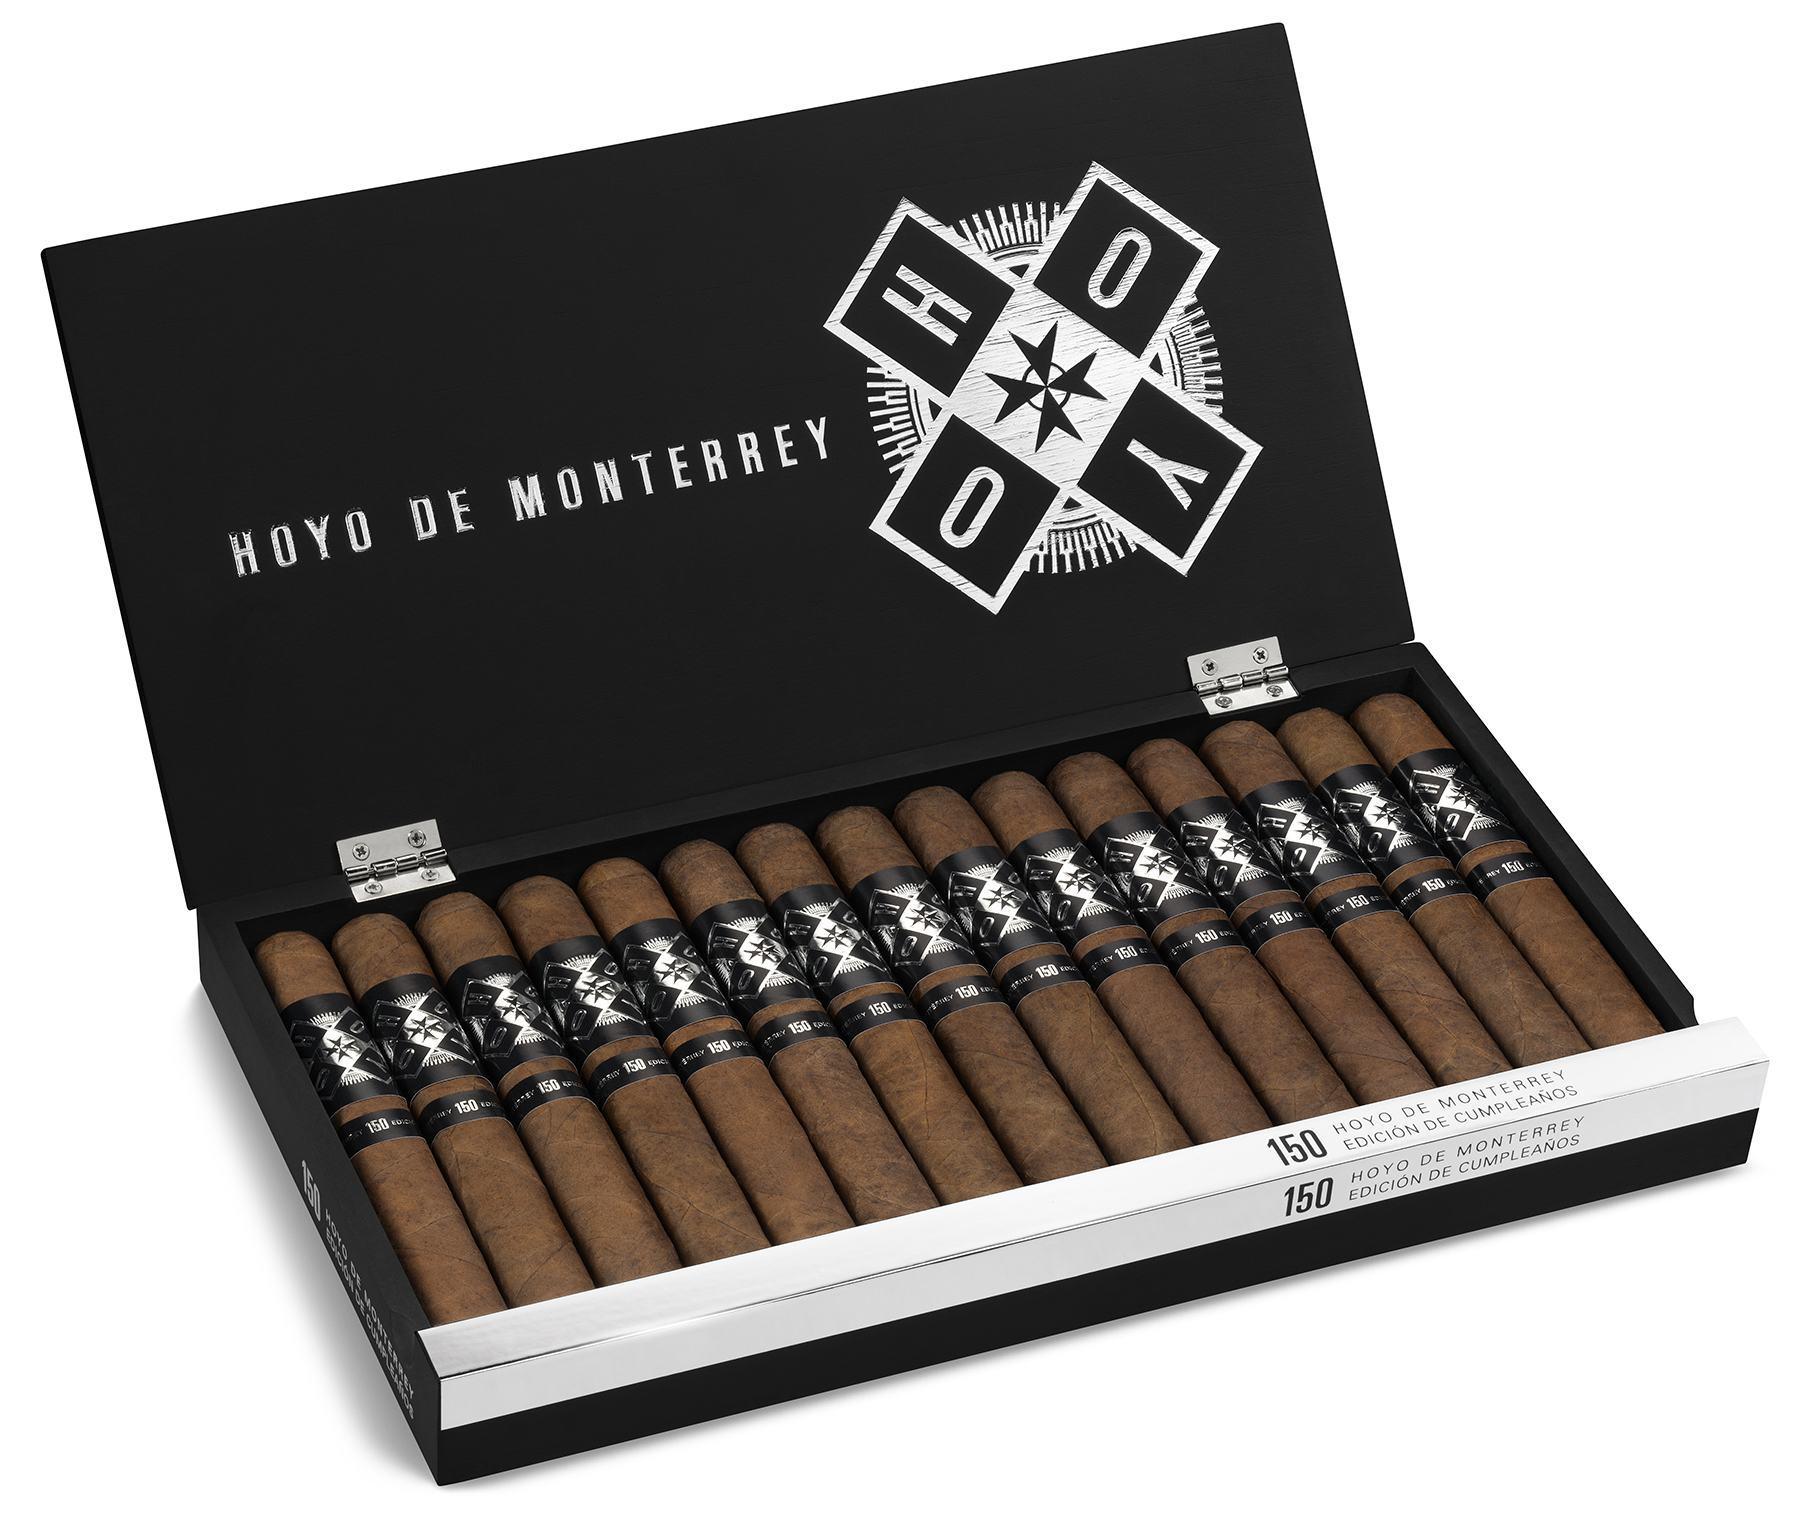 Hoyo de Monterrey 150 Open Box 1